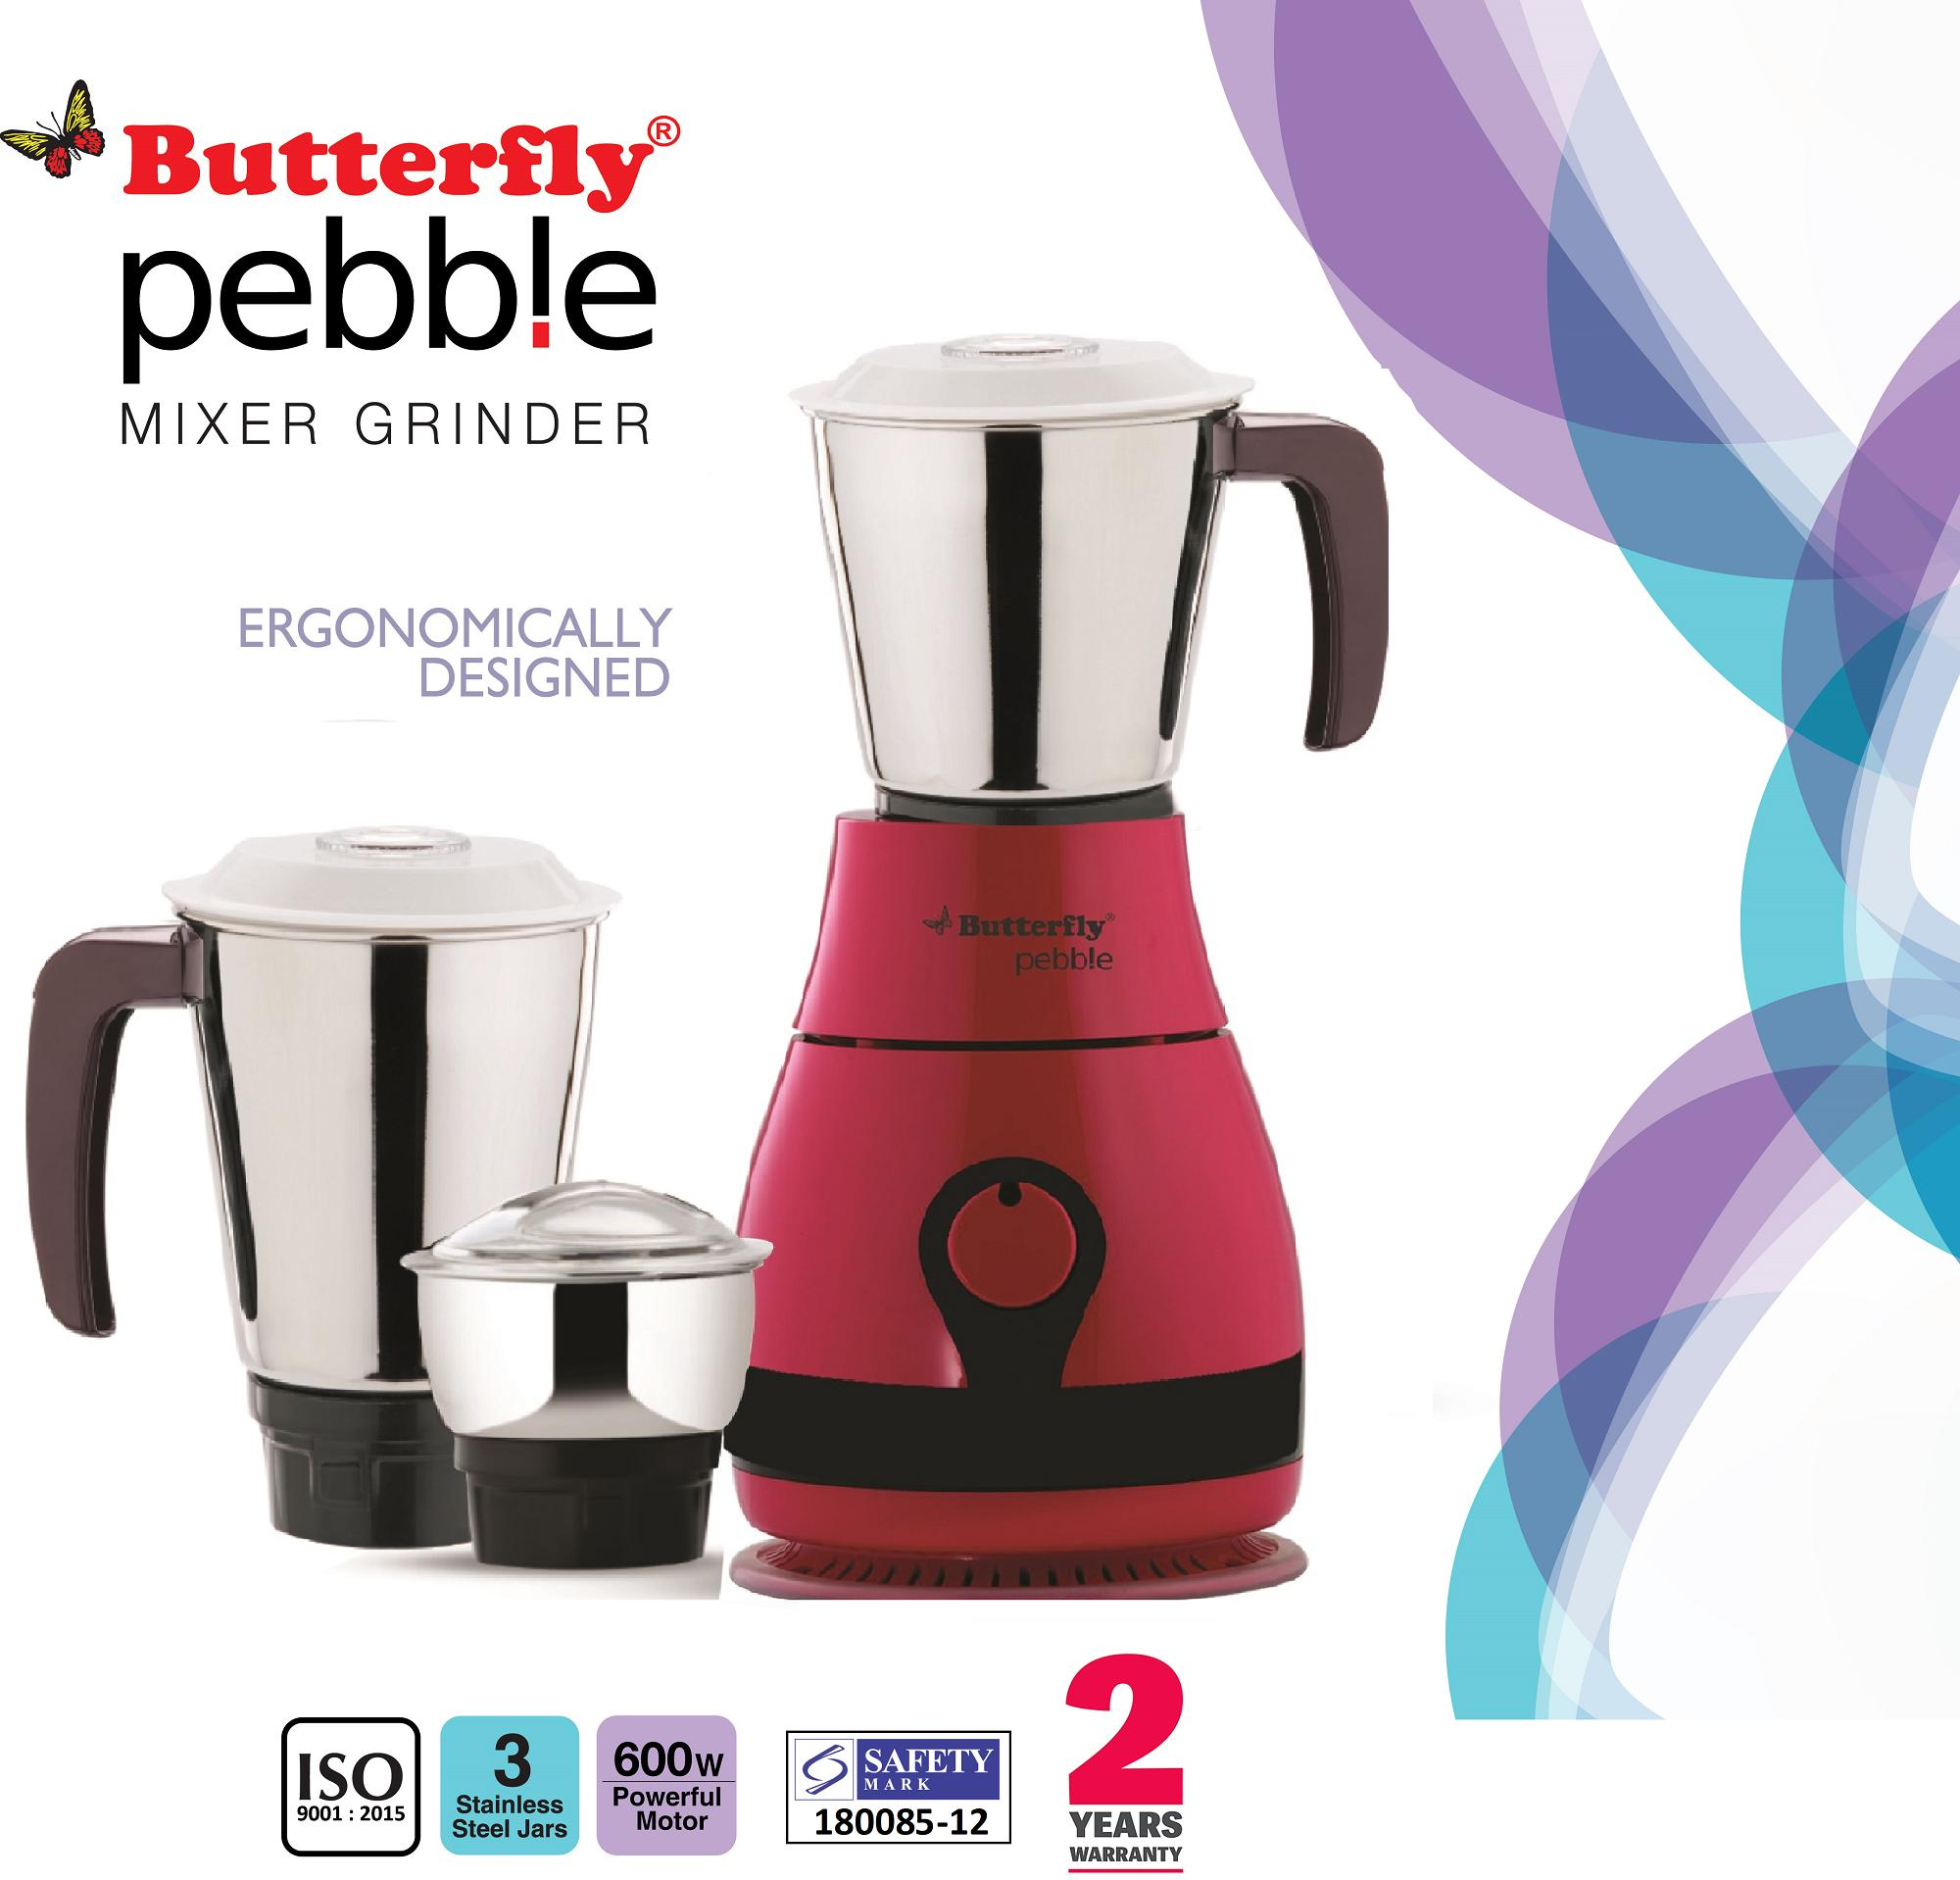 Butterfly Pebble 600-Watt Mixer Grinder with 3 Jars - ( 2 Years Warranty )